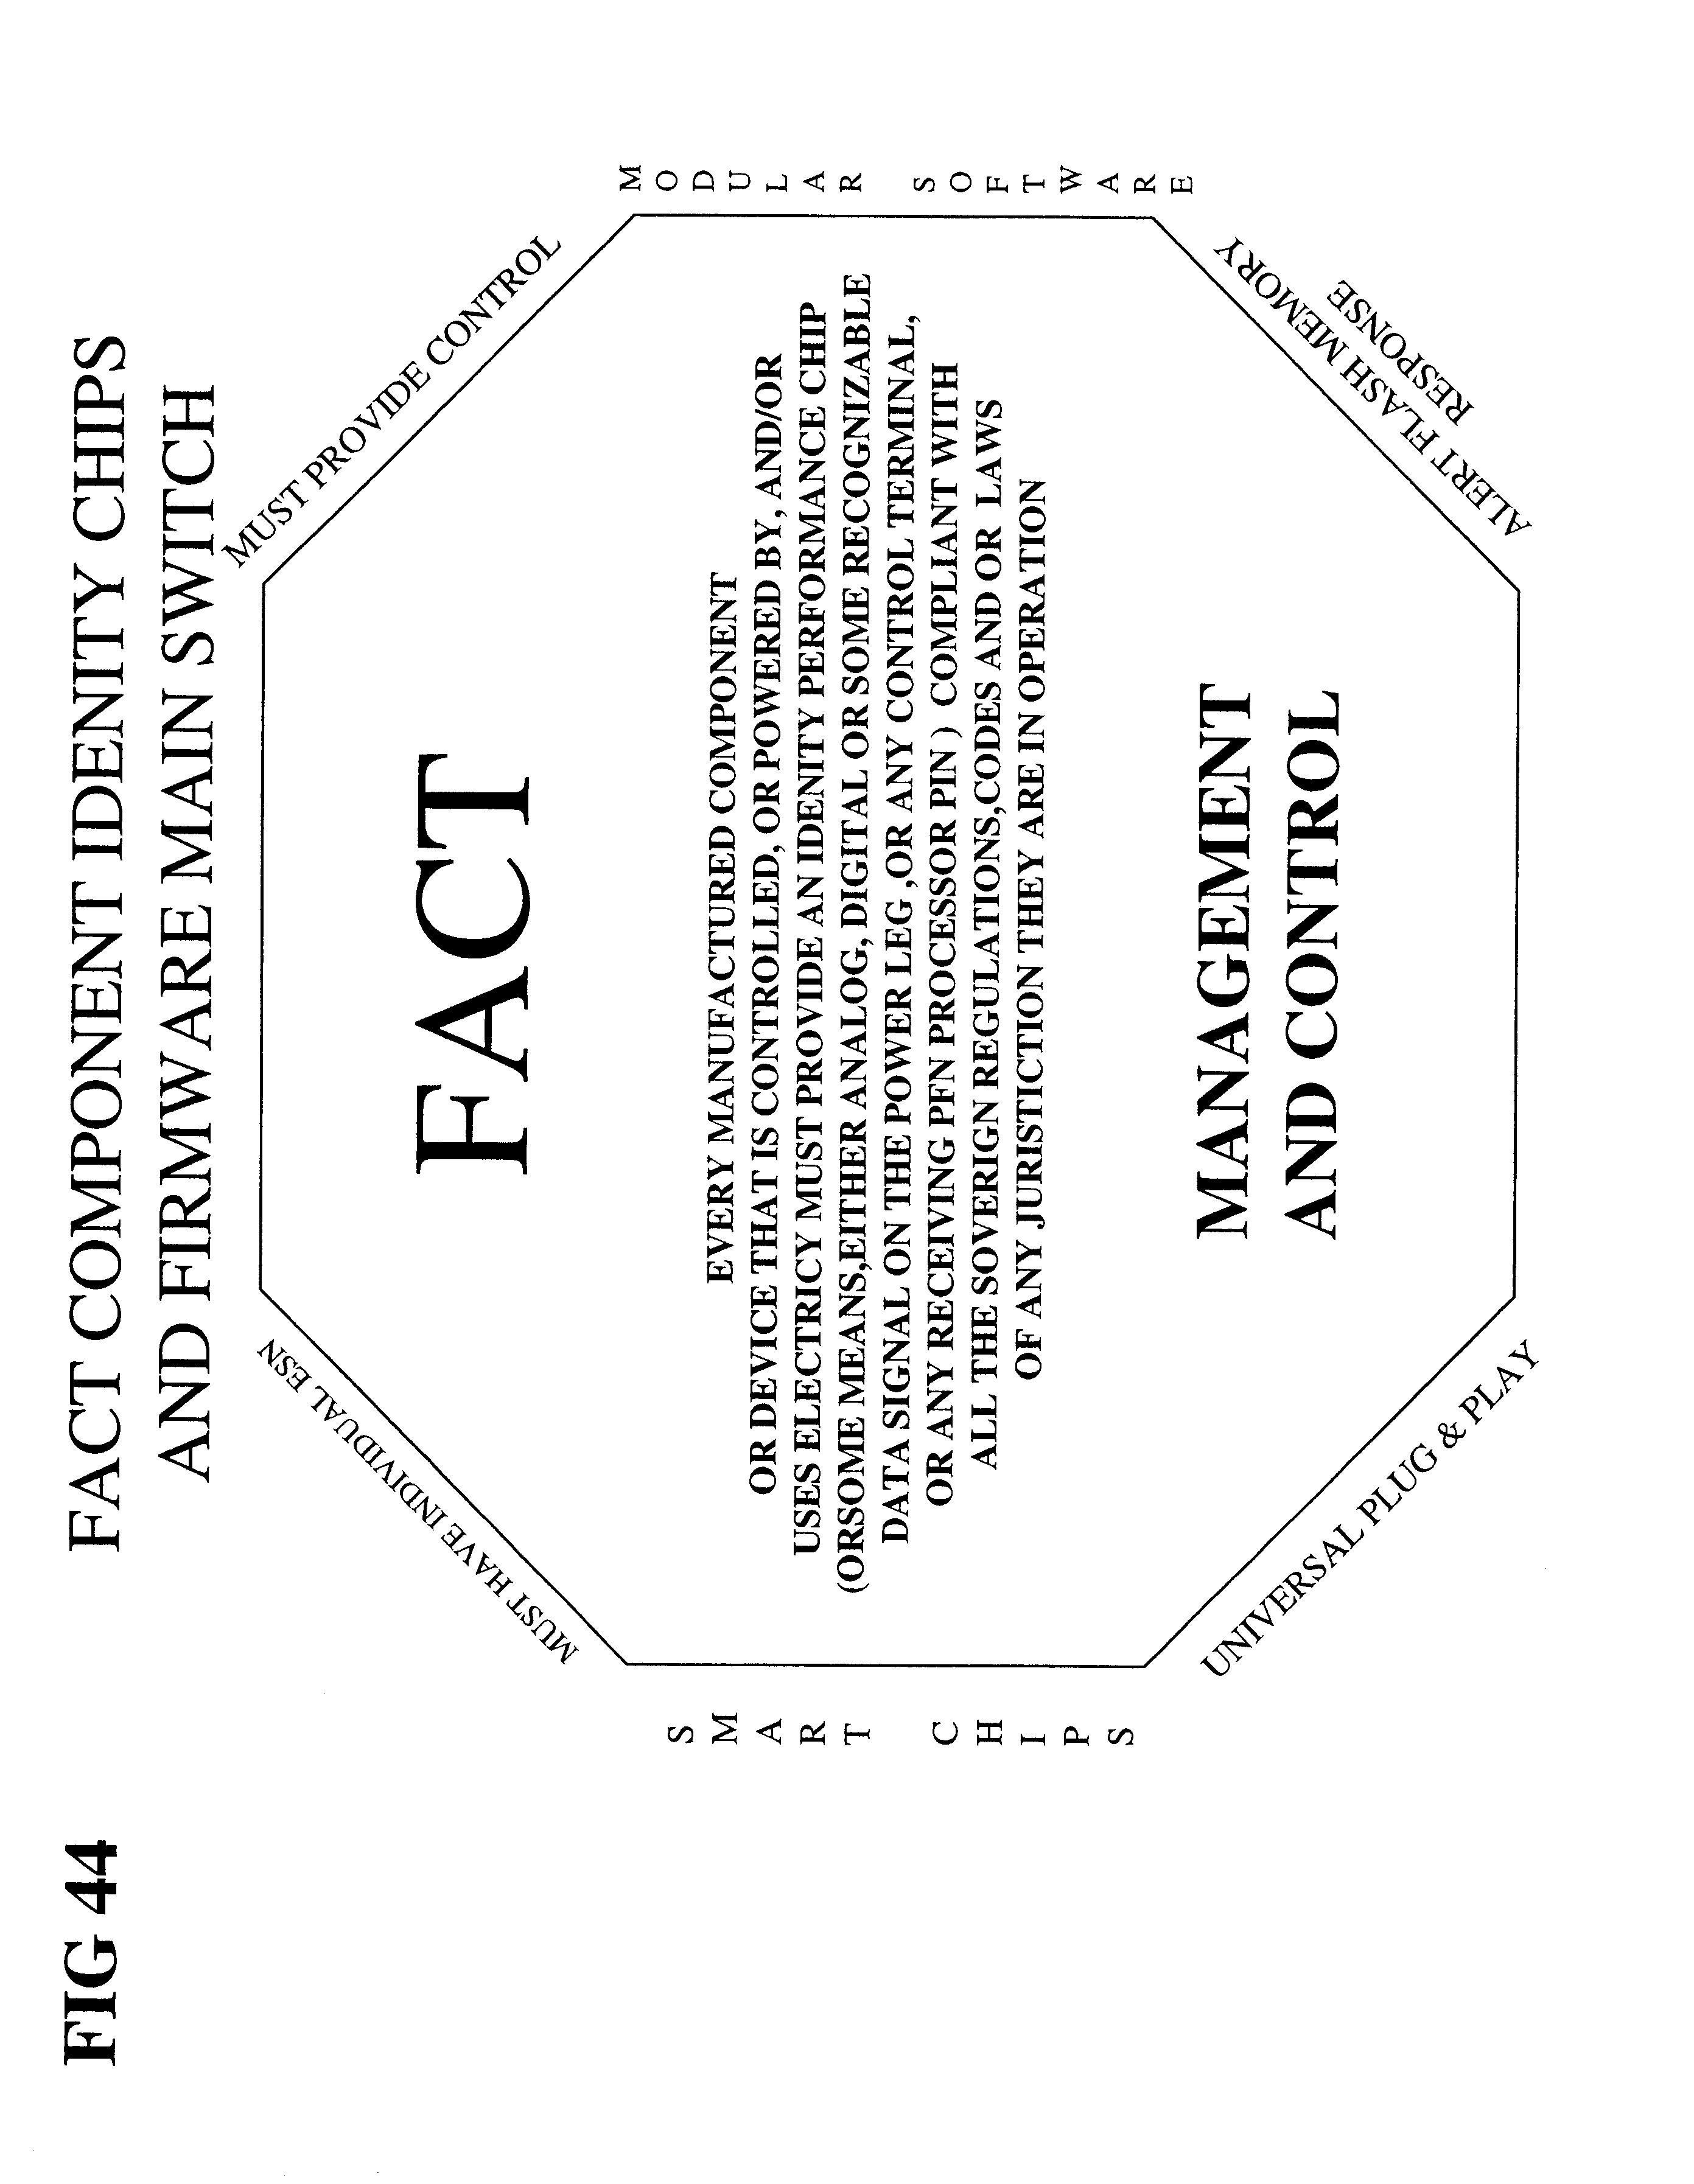 Patent US 6,965,816 B2